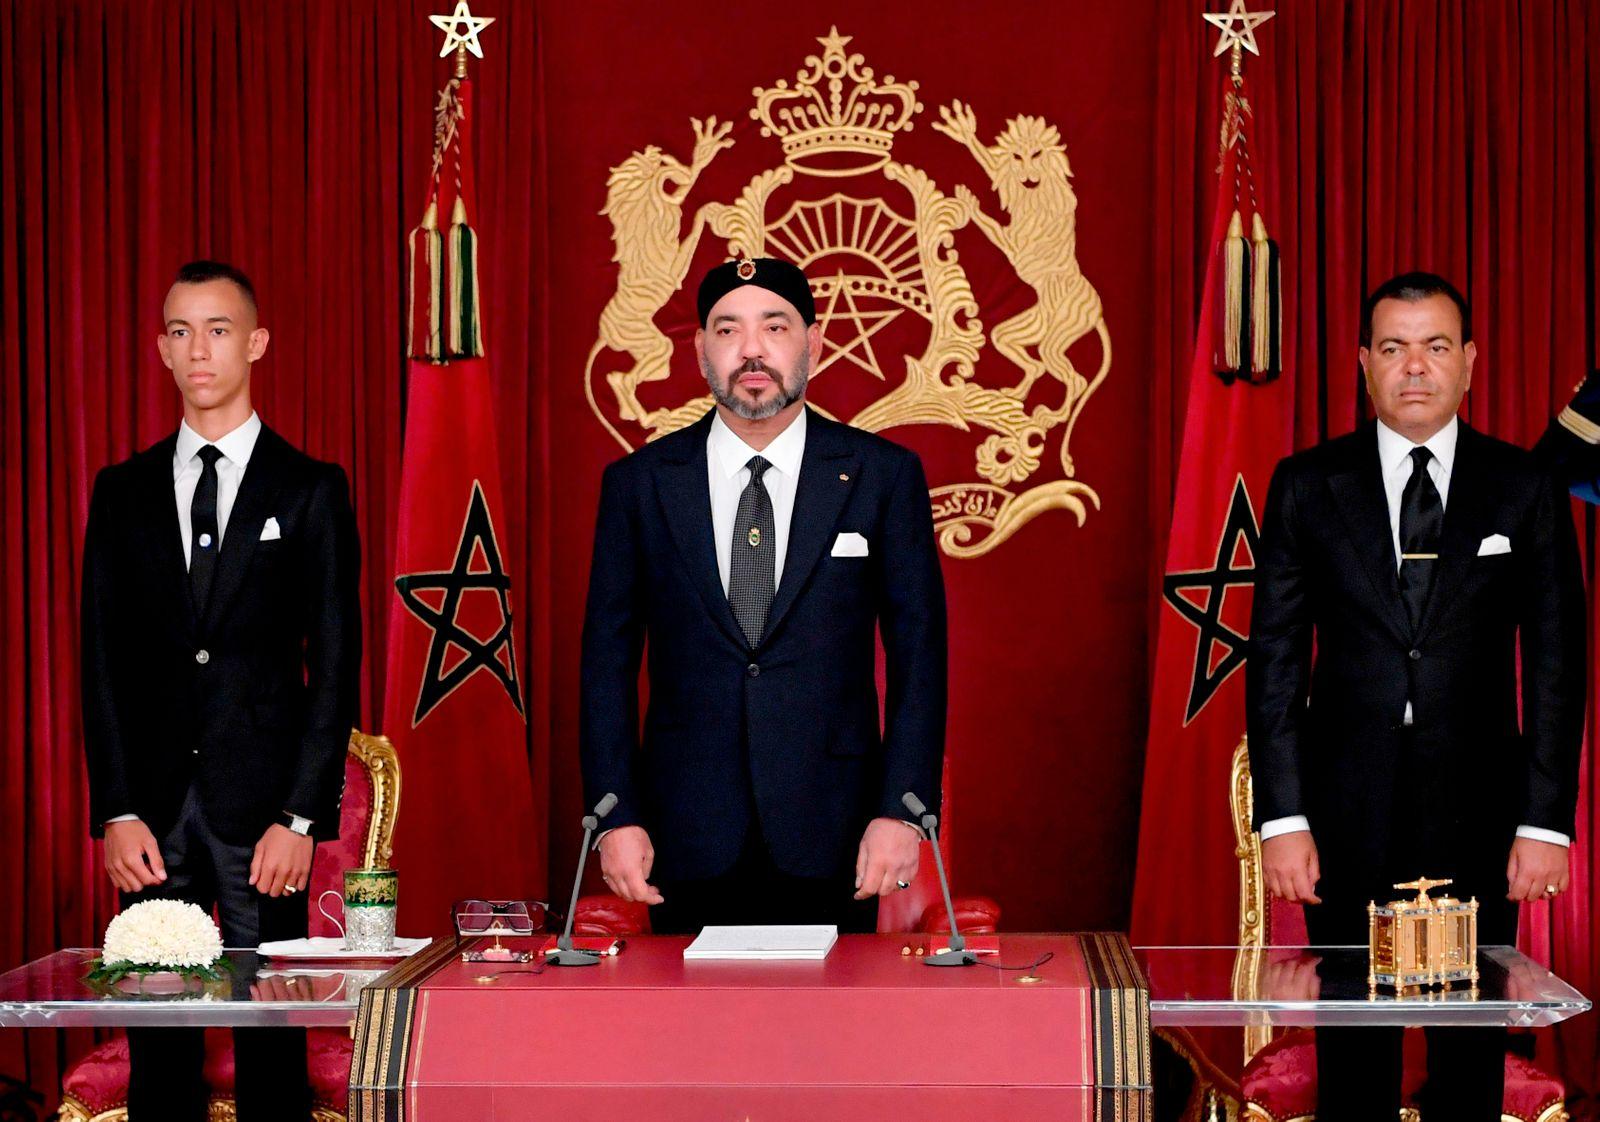 Morocco King's Speech